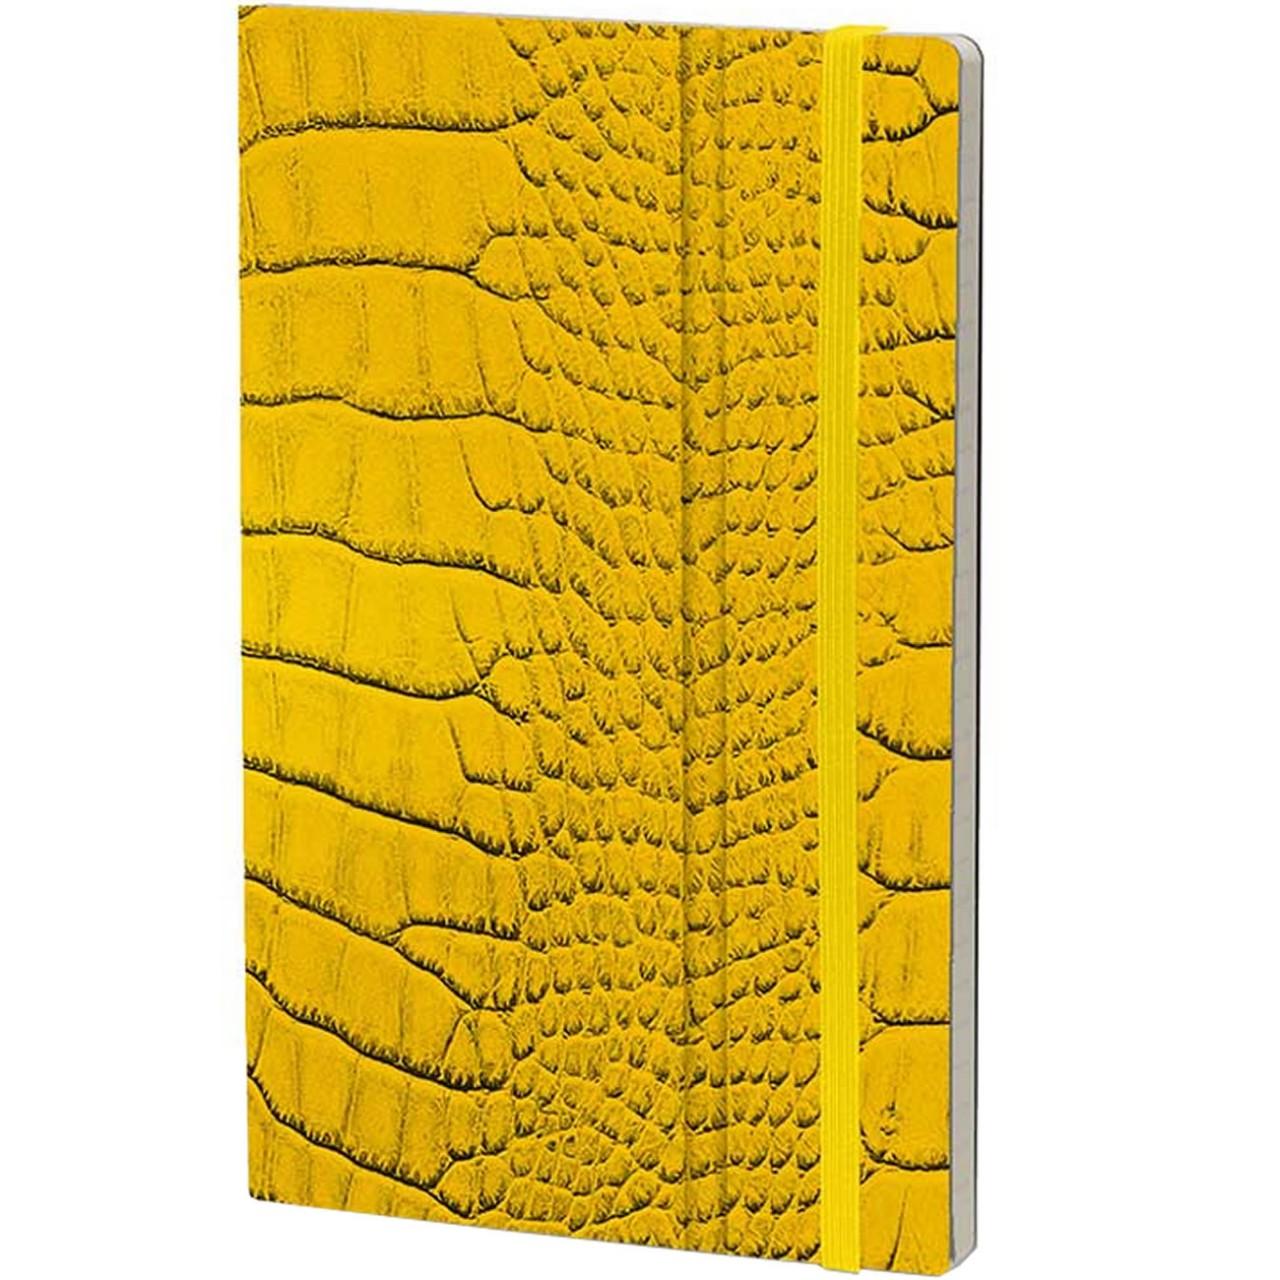 Stifflexible Notizbuch MRS CROCODILE 9 x 14 cm 144 S., YELLOW